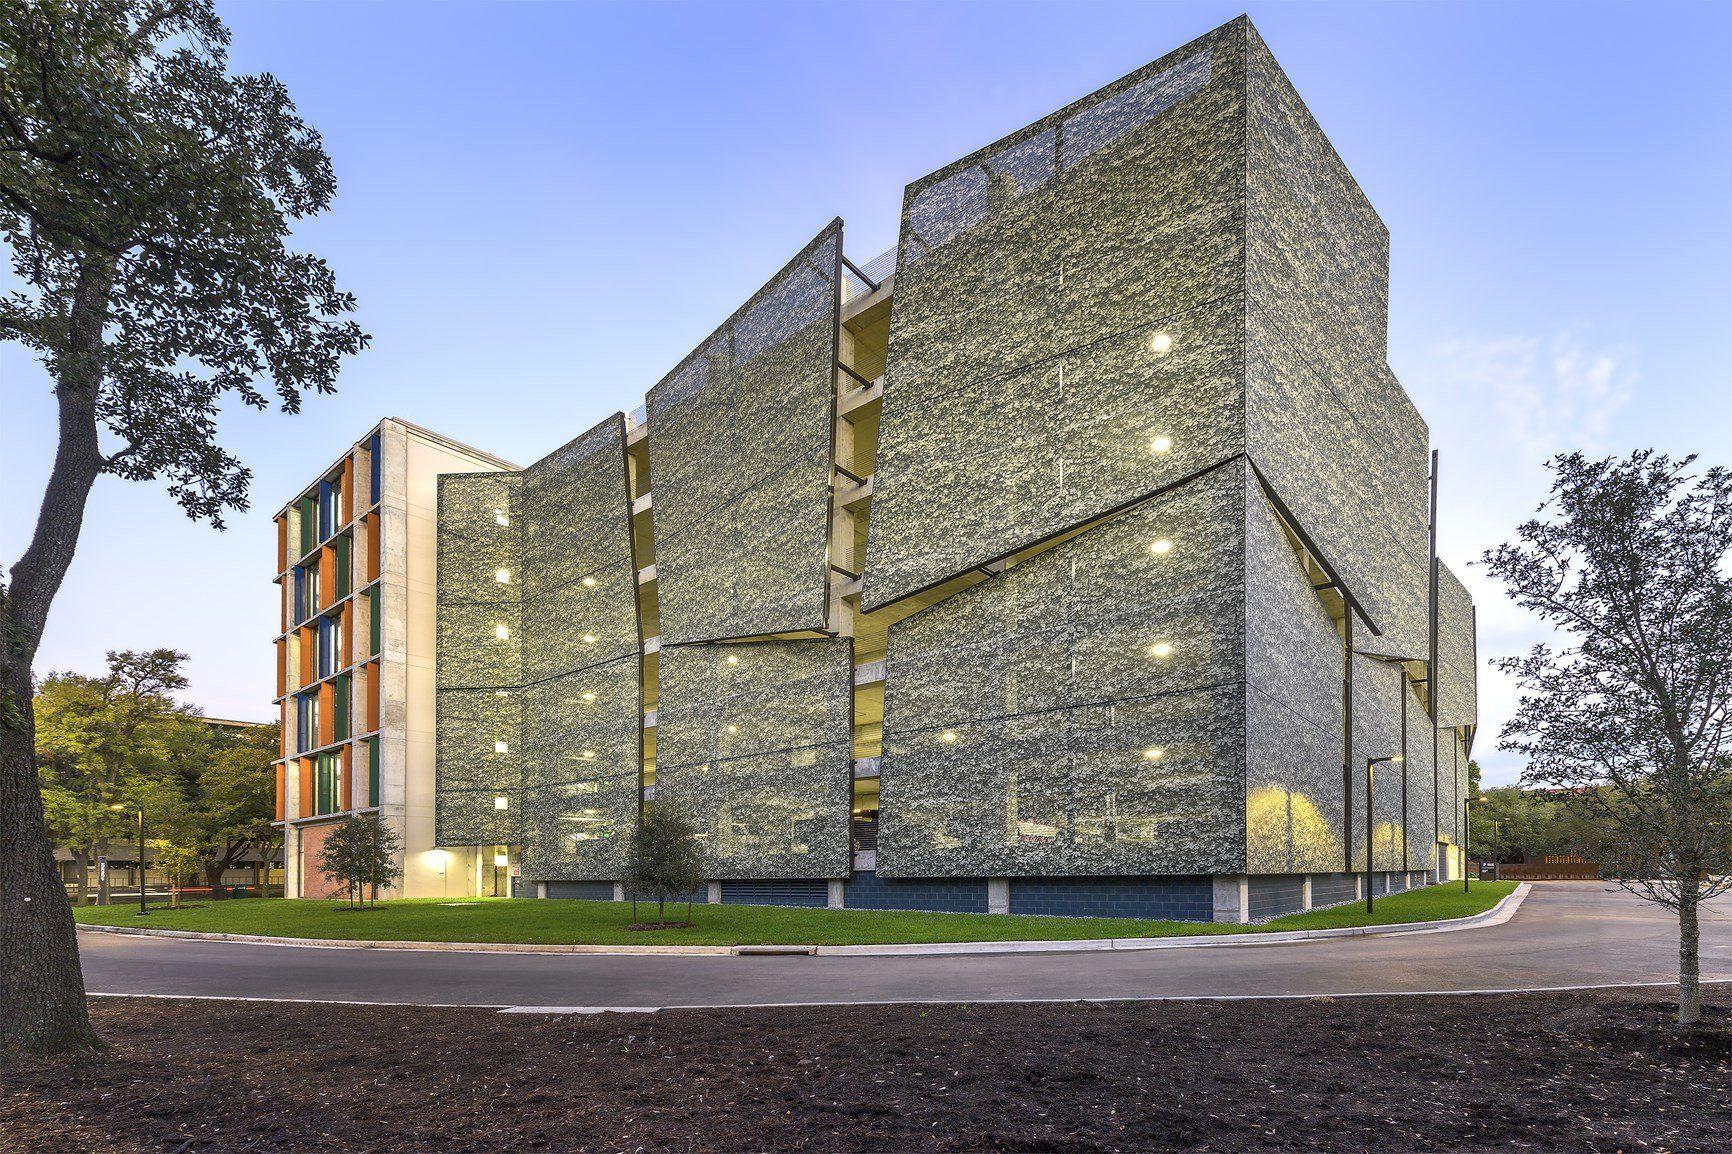 Parcheggio, Rice University di Houston - Copyright: 2017 G. LYON PHOTOGRAPHY, Inc.